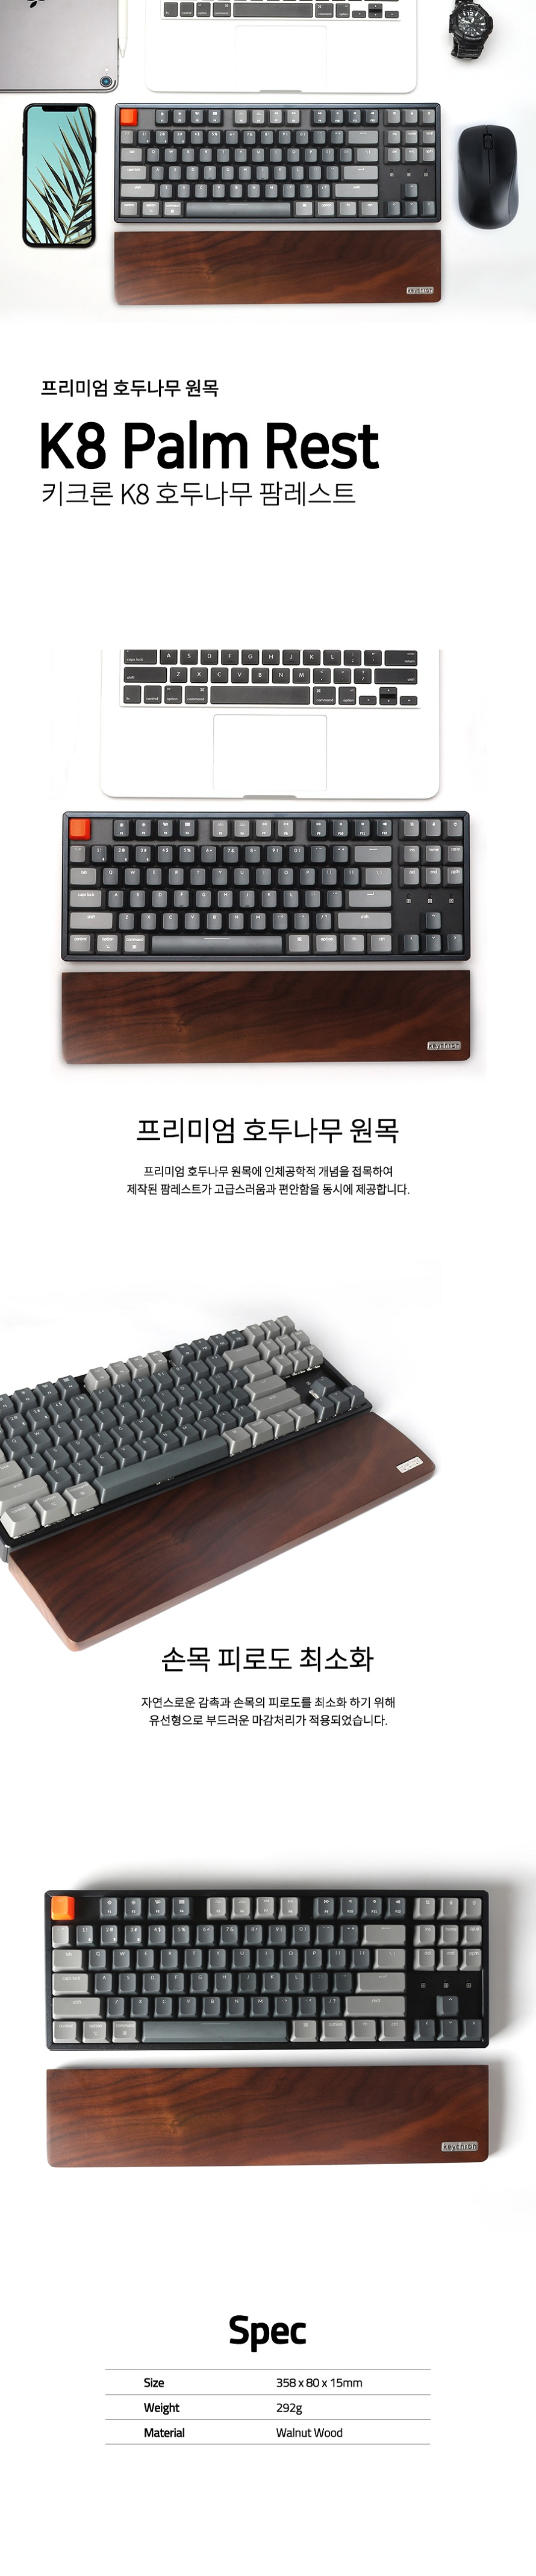 Keychron K8용 호두나무 원목 손목받침대